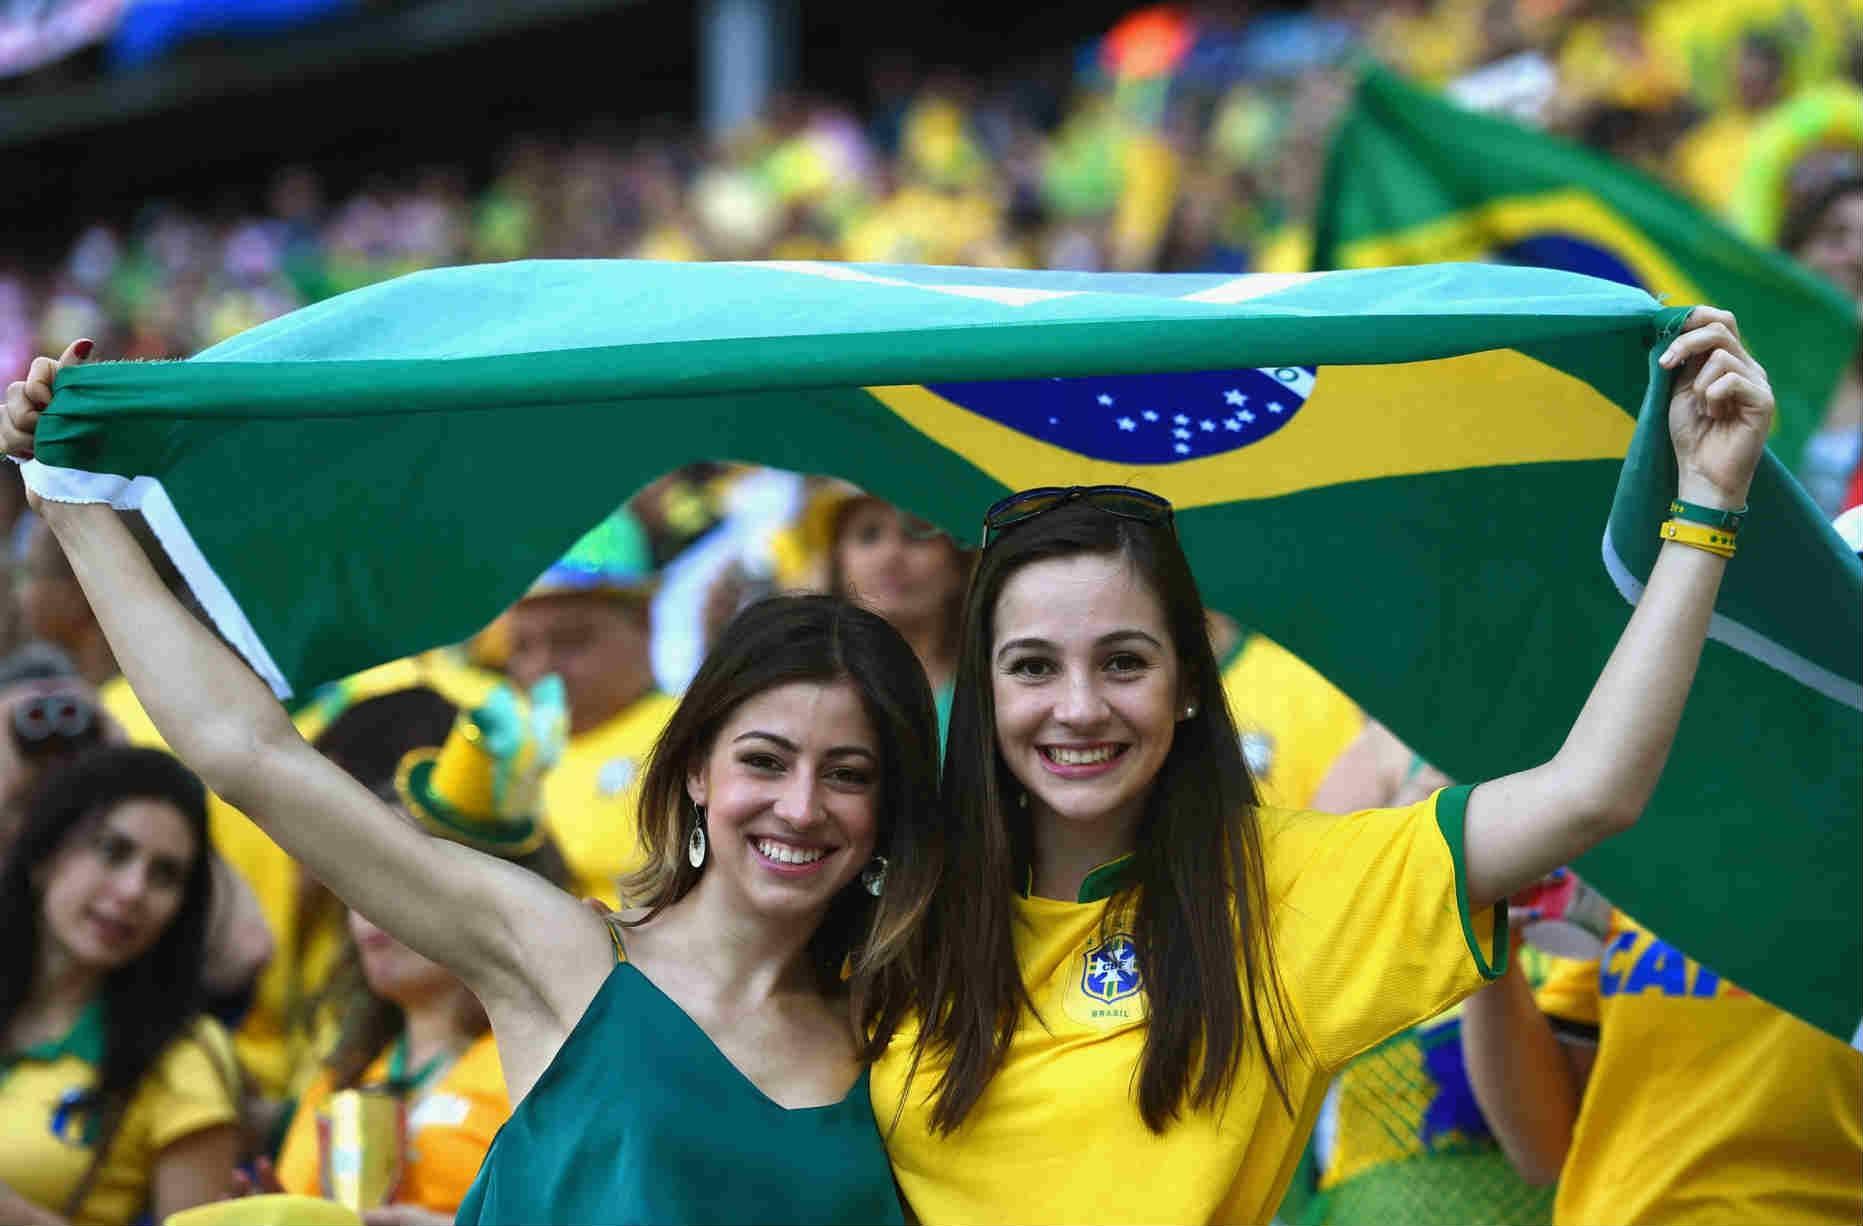 brazilsexyfans15287644647411602310775c2a89370c8cp.jpg